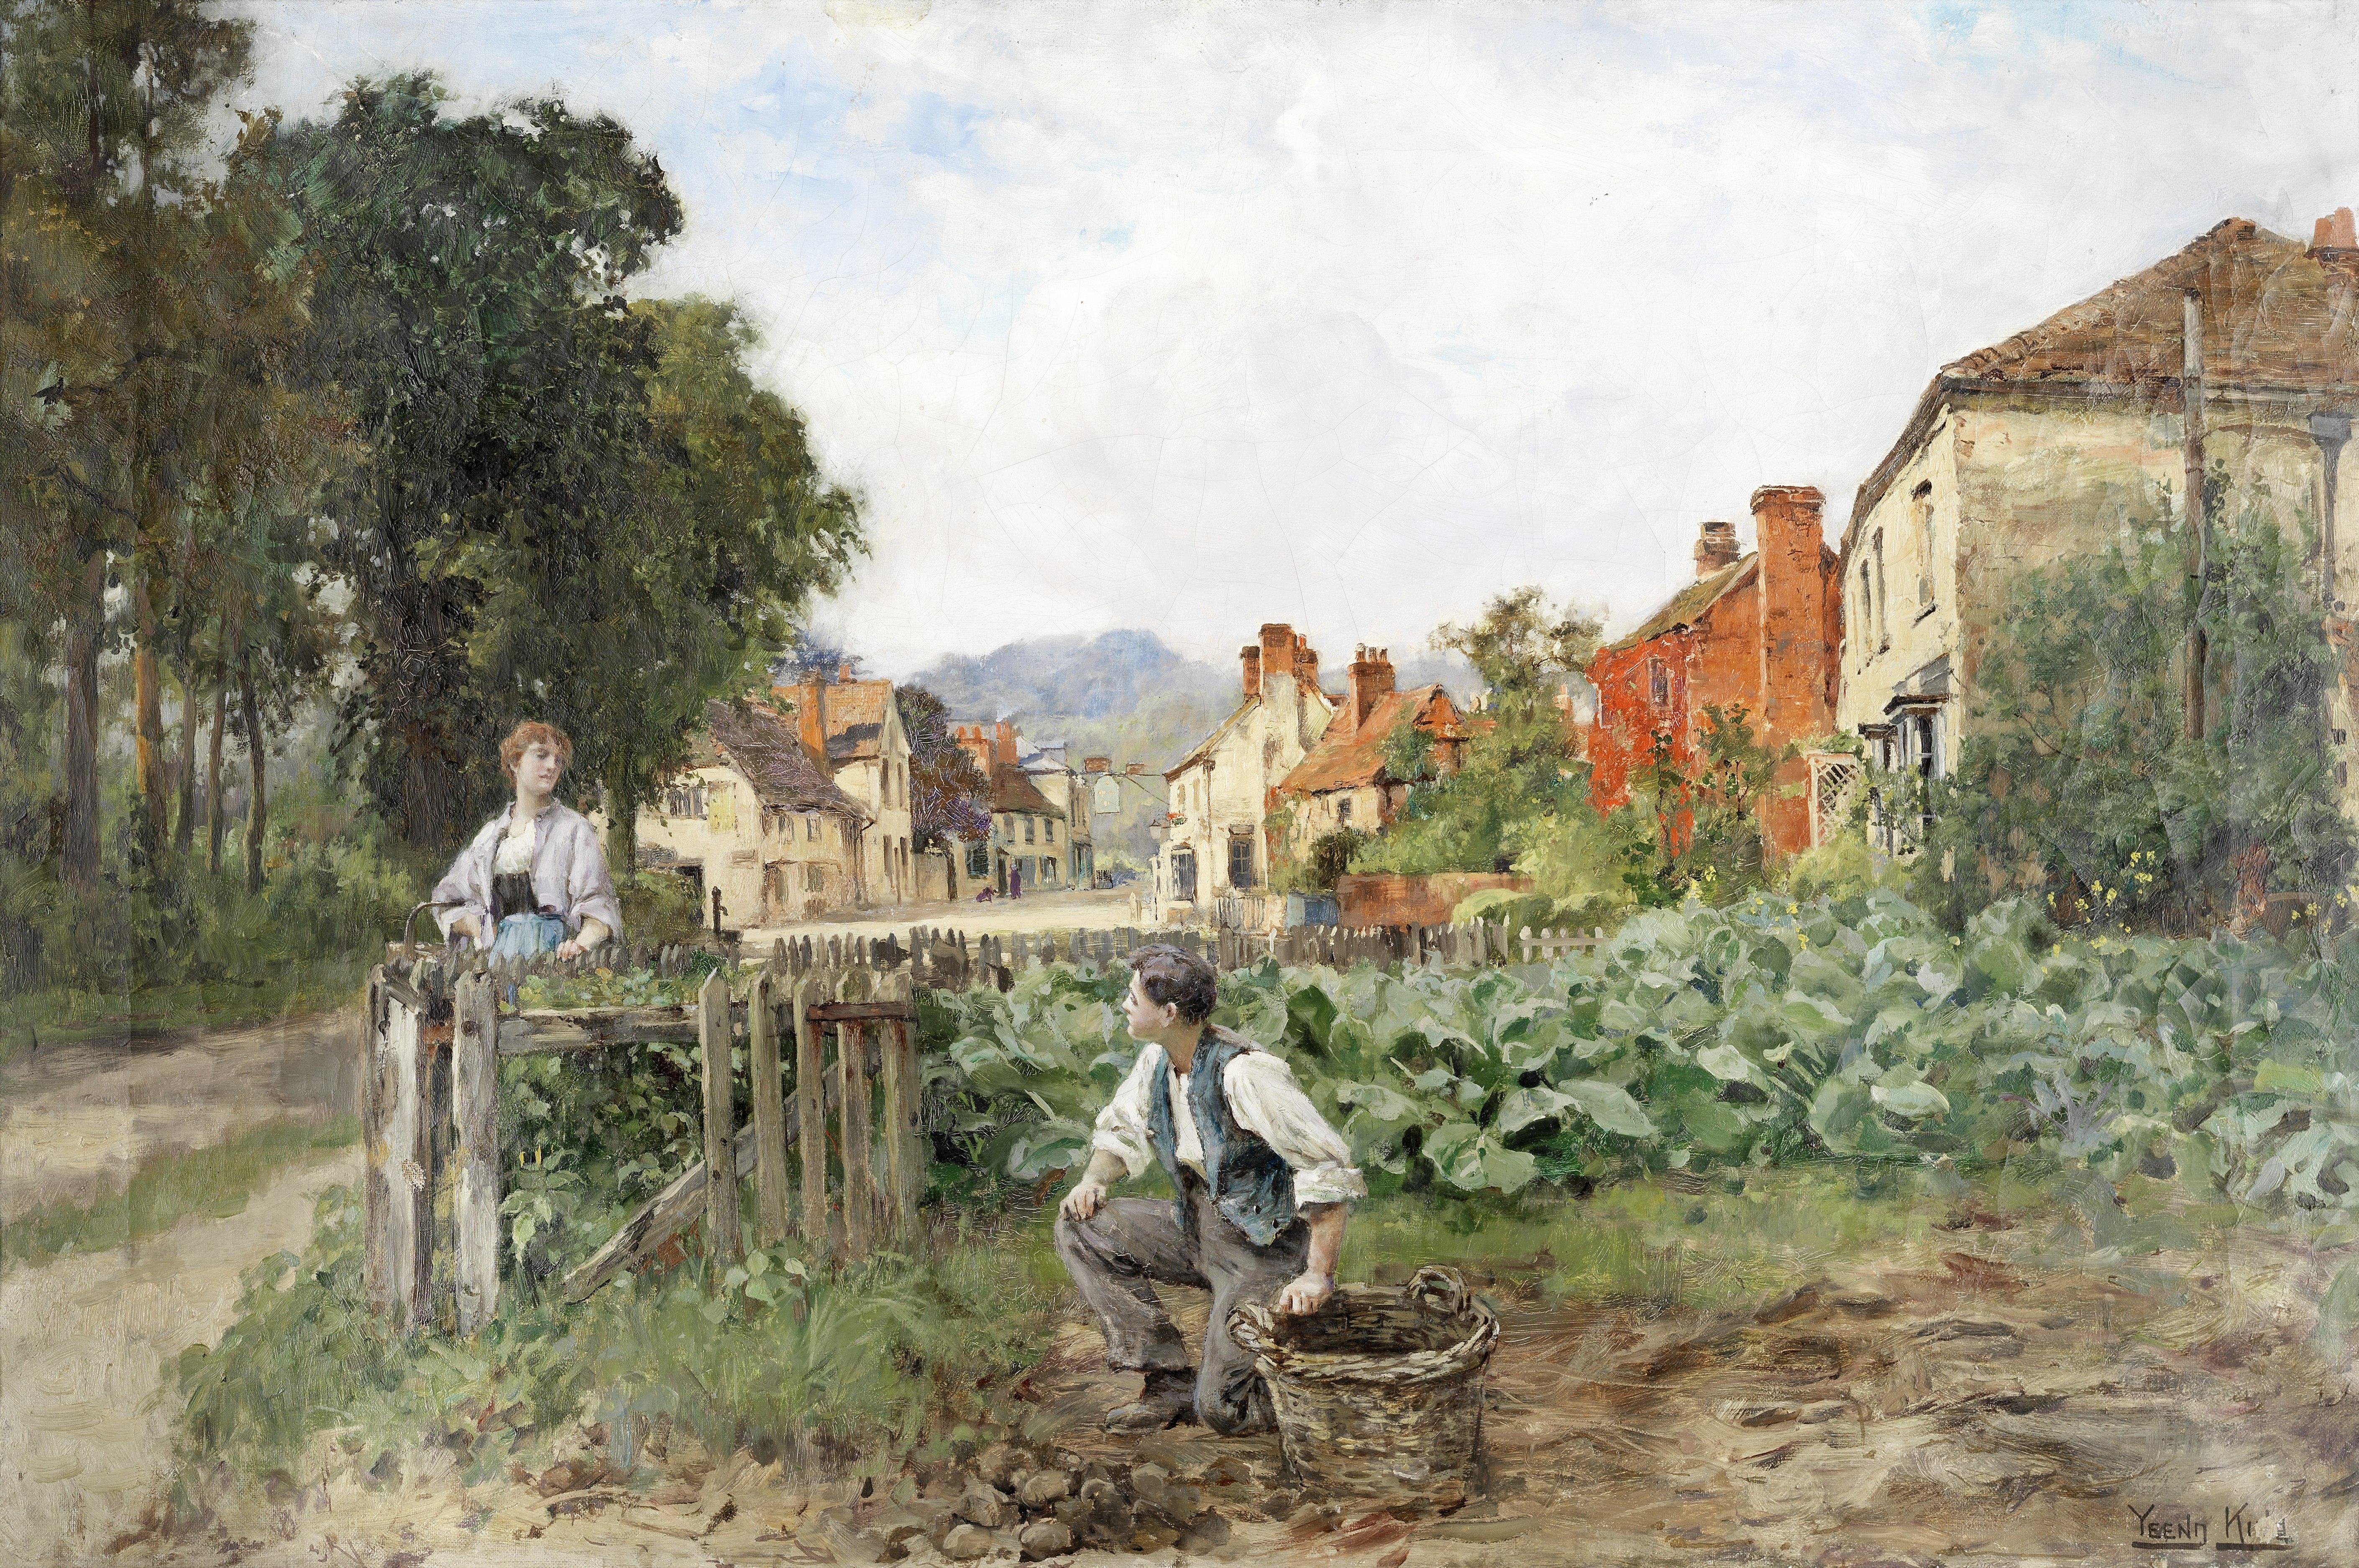 Henry John Yeend King, RBA, VPRI, ROI (British, 1855-1924) Rural courtship